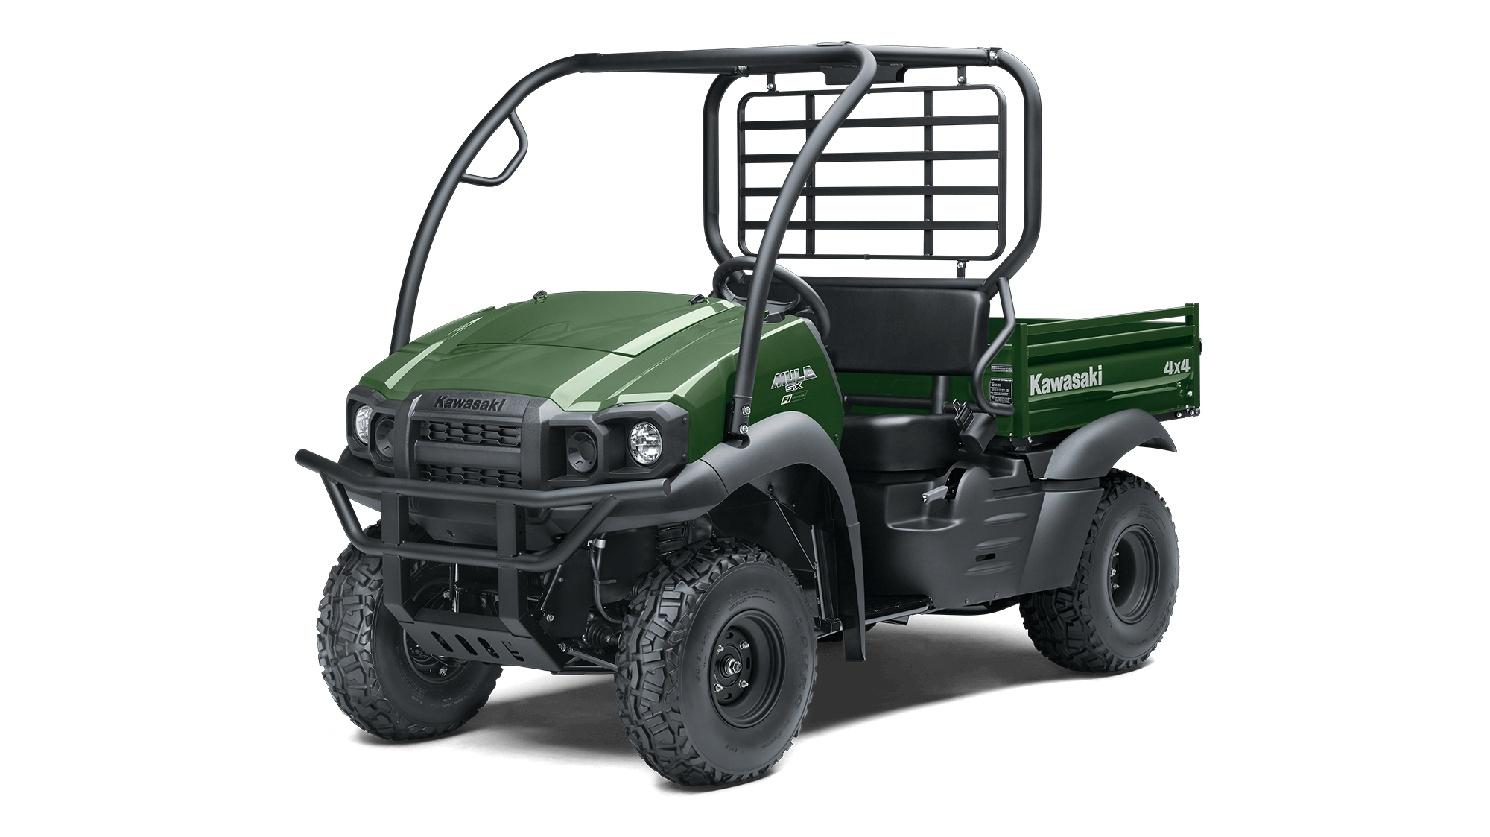 2020 Kawasaki MULE SX 4×4 FI Timberline Green